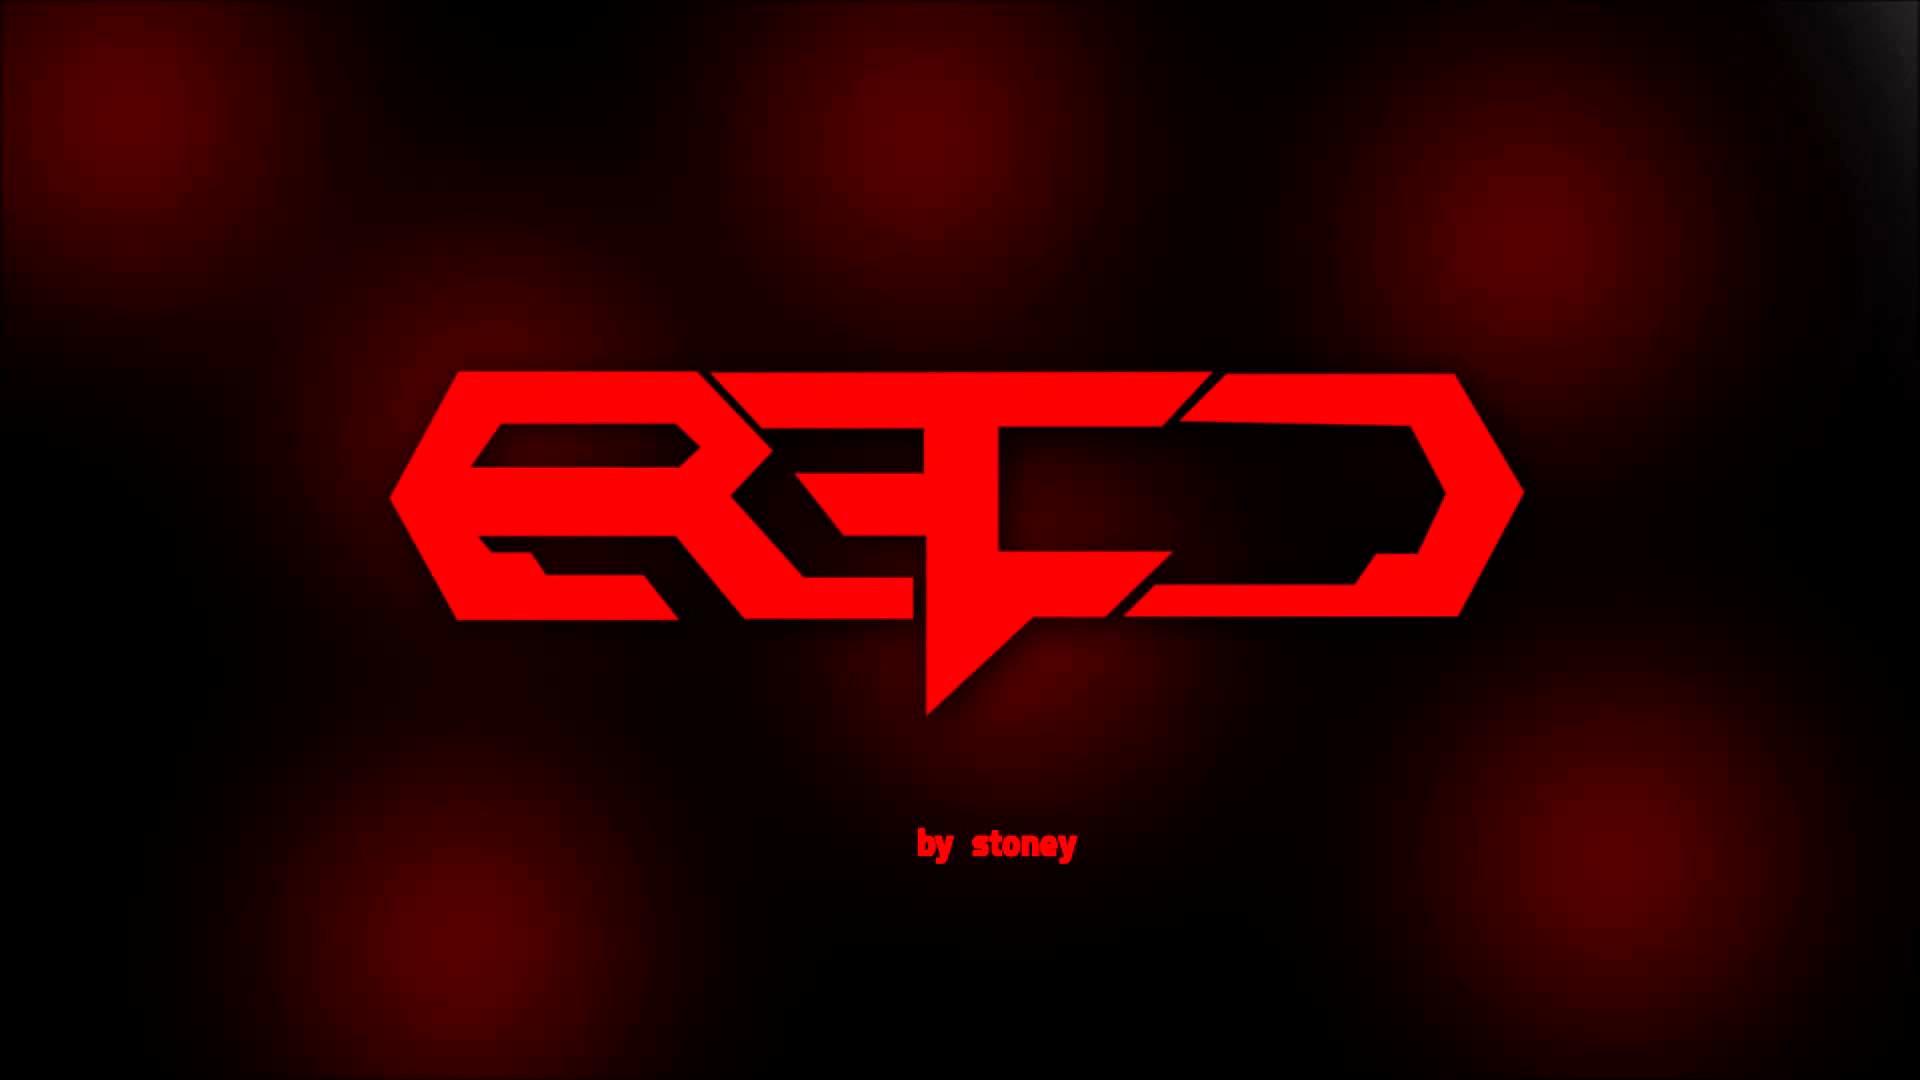 Res: 1920x1080, Faze Clan Logo Wallpaper Inspirational Red Psd